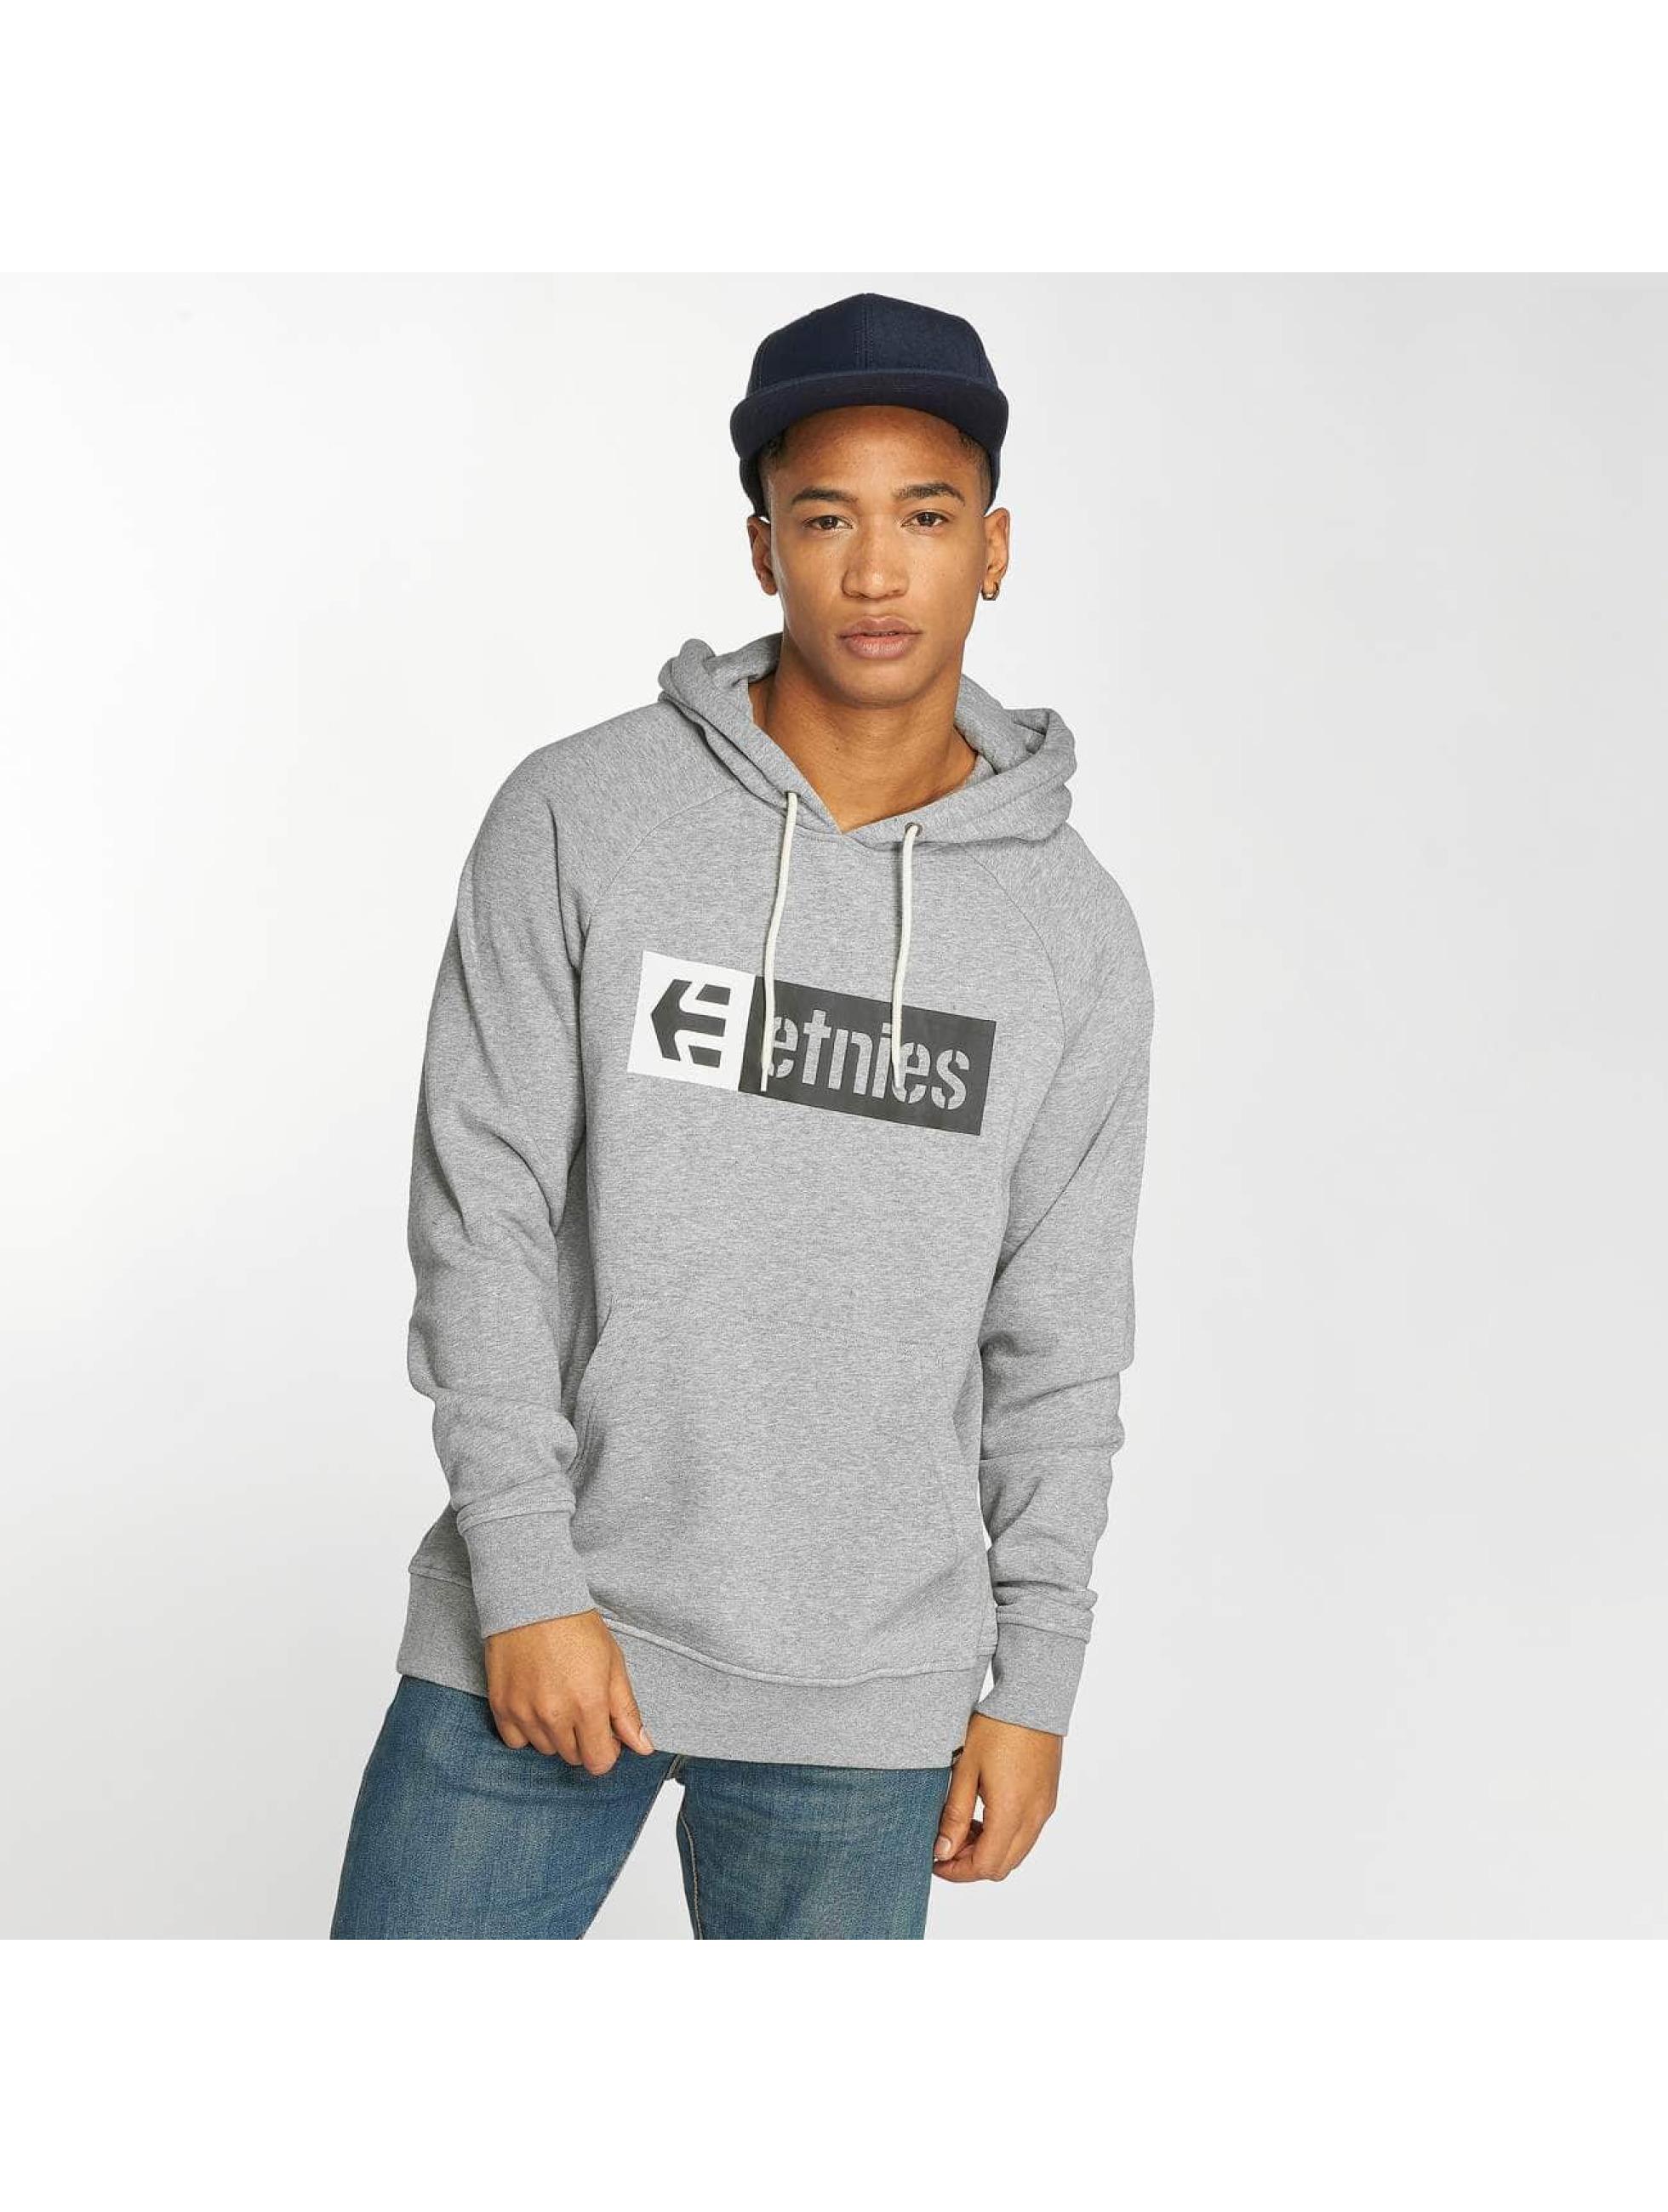 Etnies Hoodie New Box gray